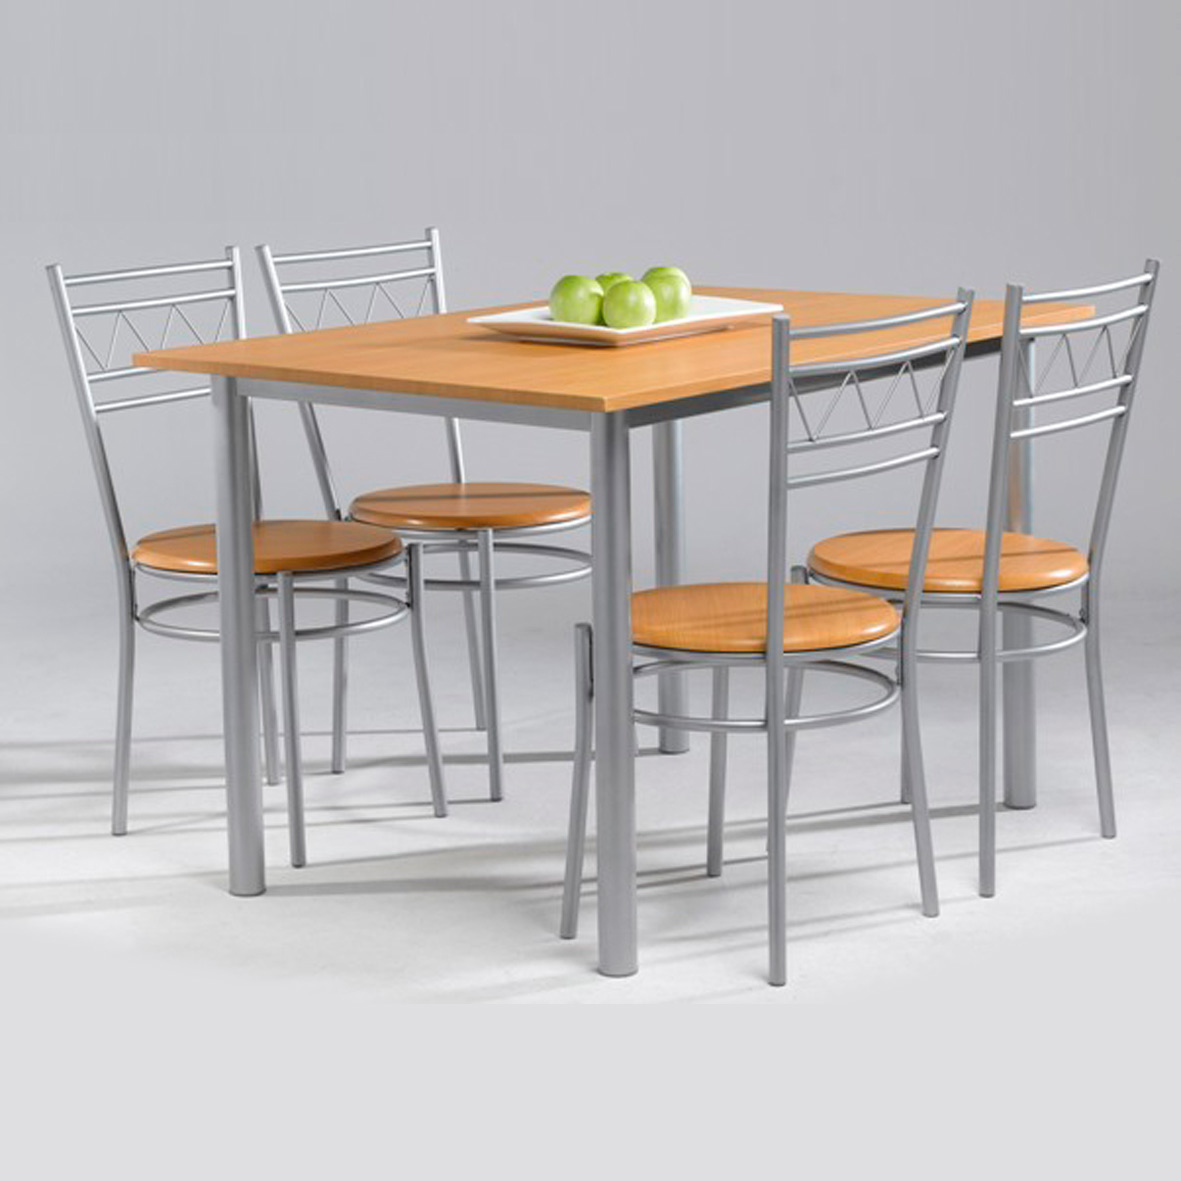 Conjunto anillo de mesa de cocina 4 sillas muebles for Sillas para cocina precios